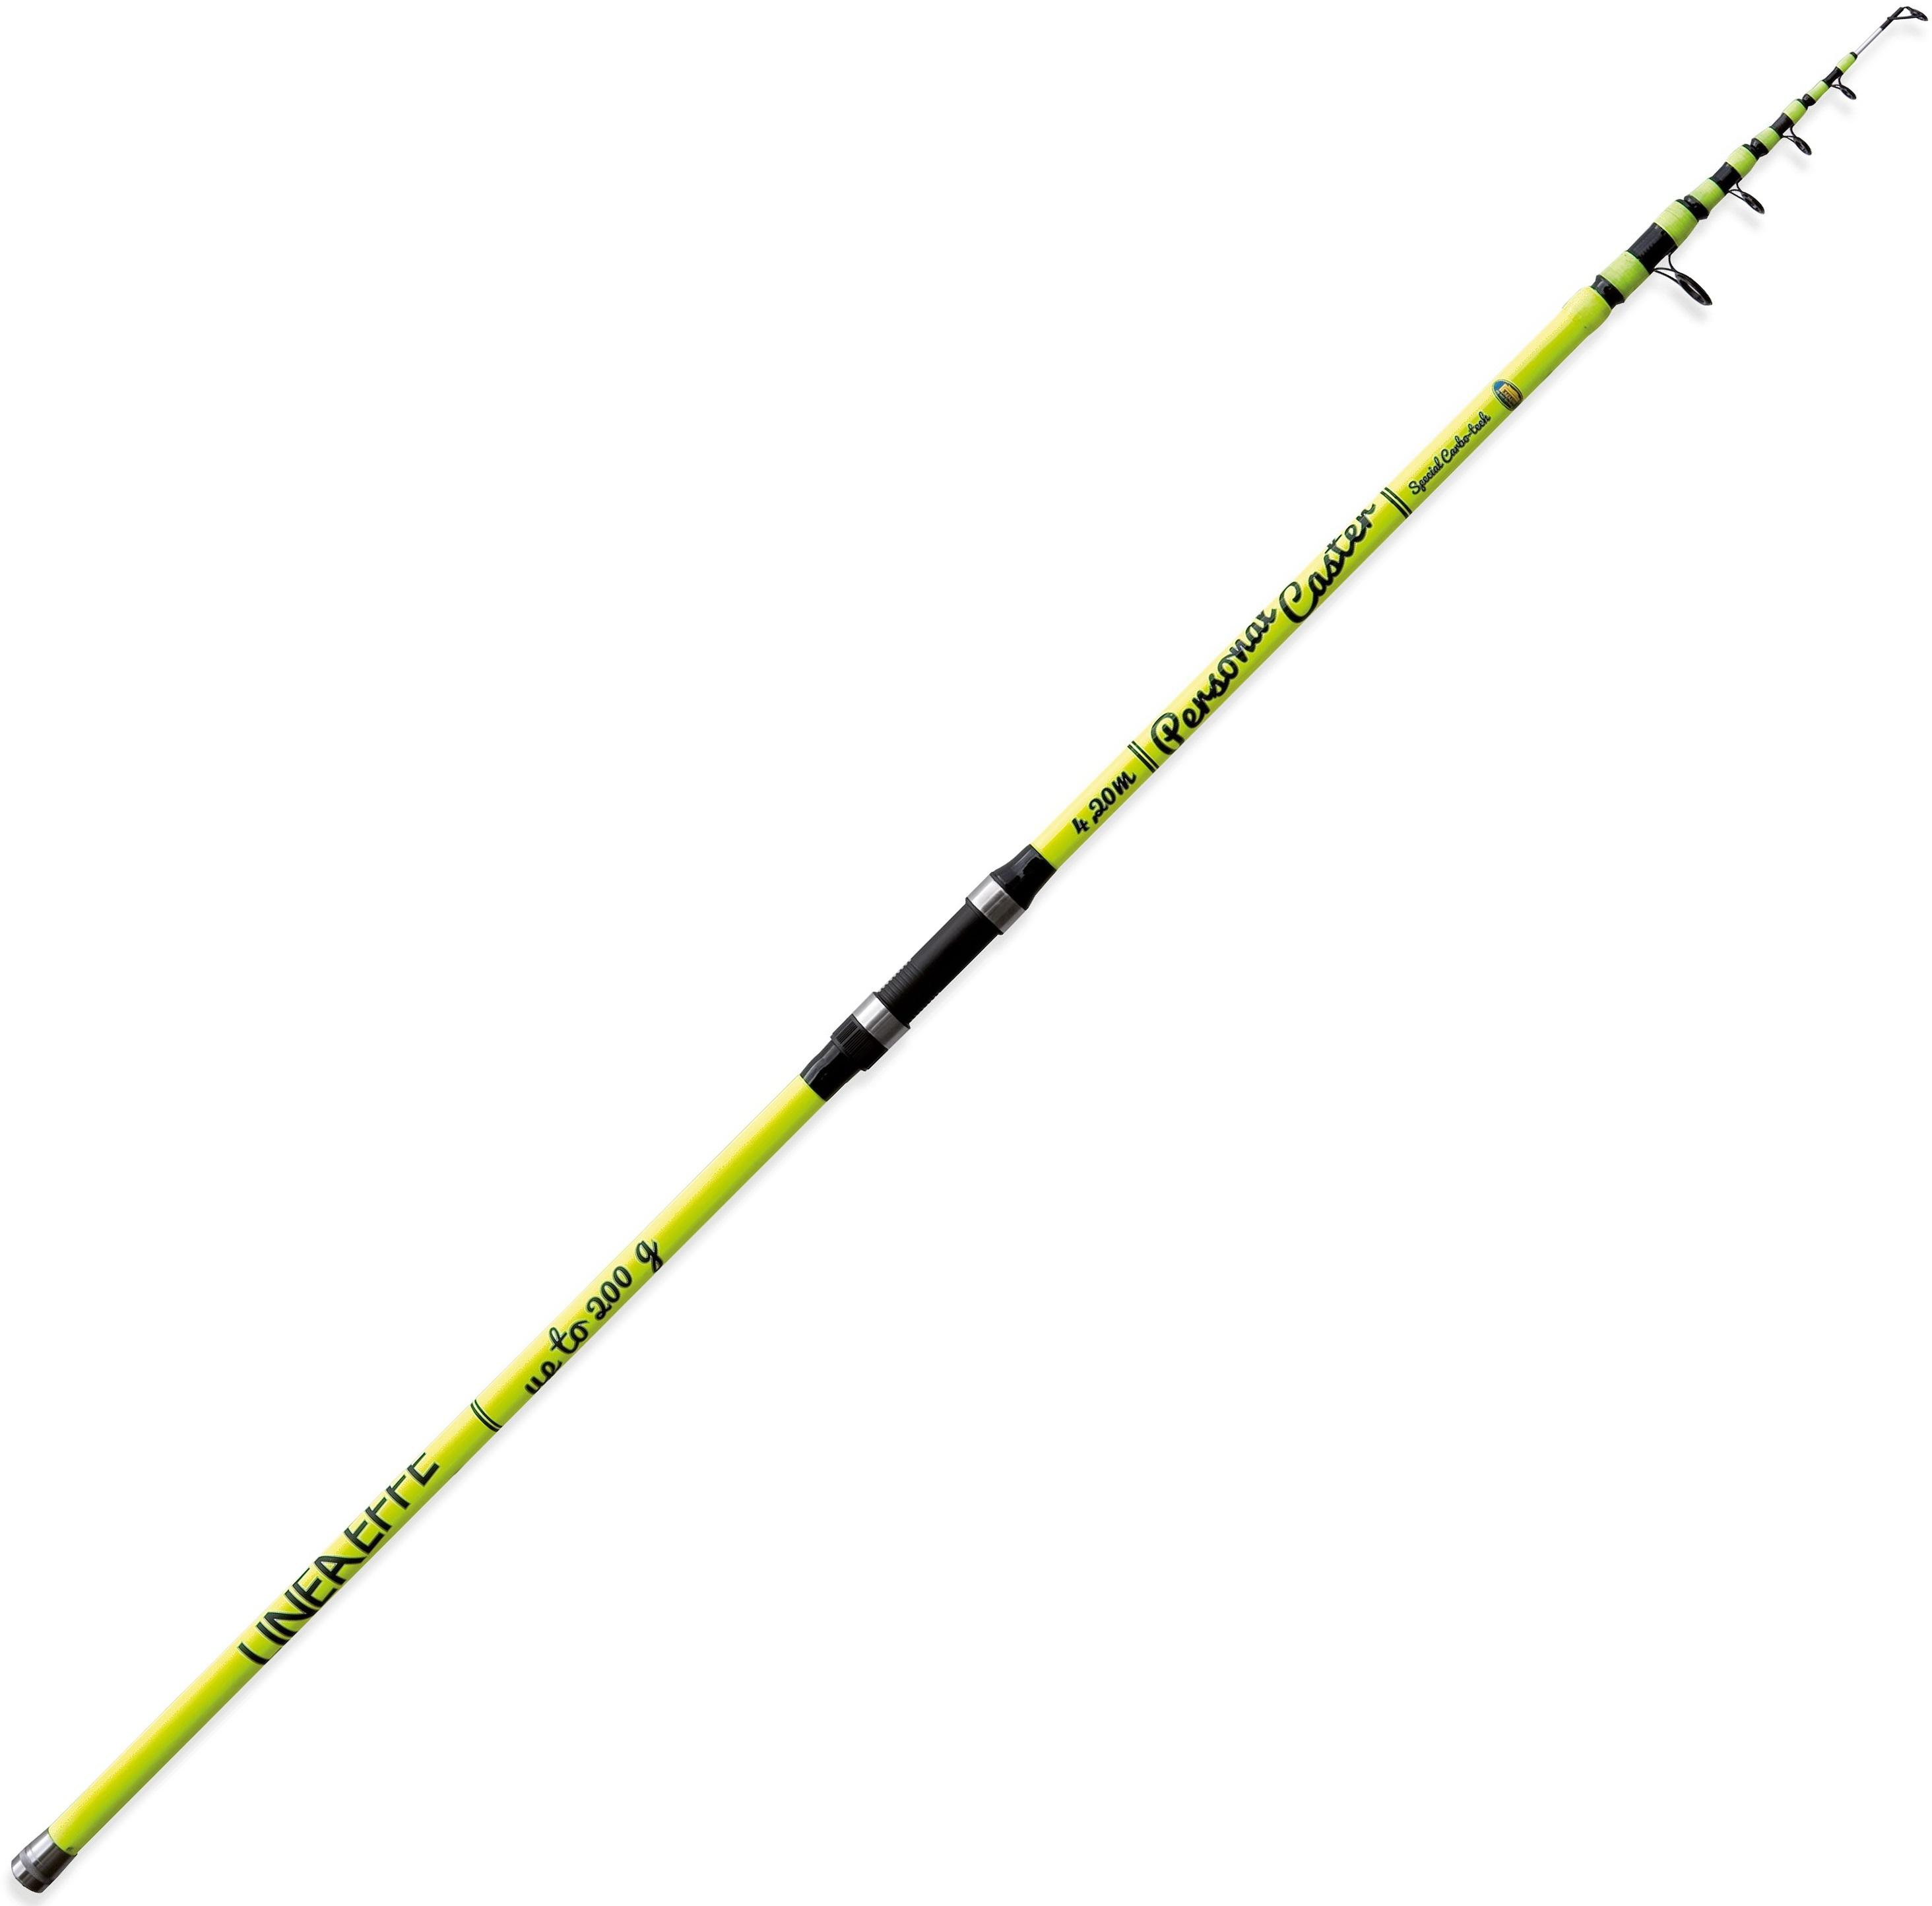 Удилище сёрфовое Lineaeffe Personal Caster WWG 4.2м 200г